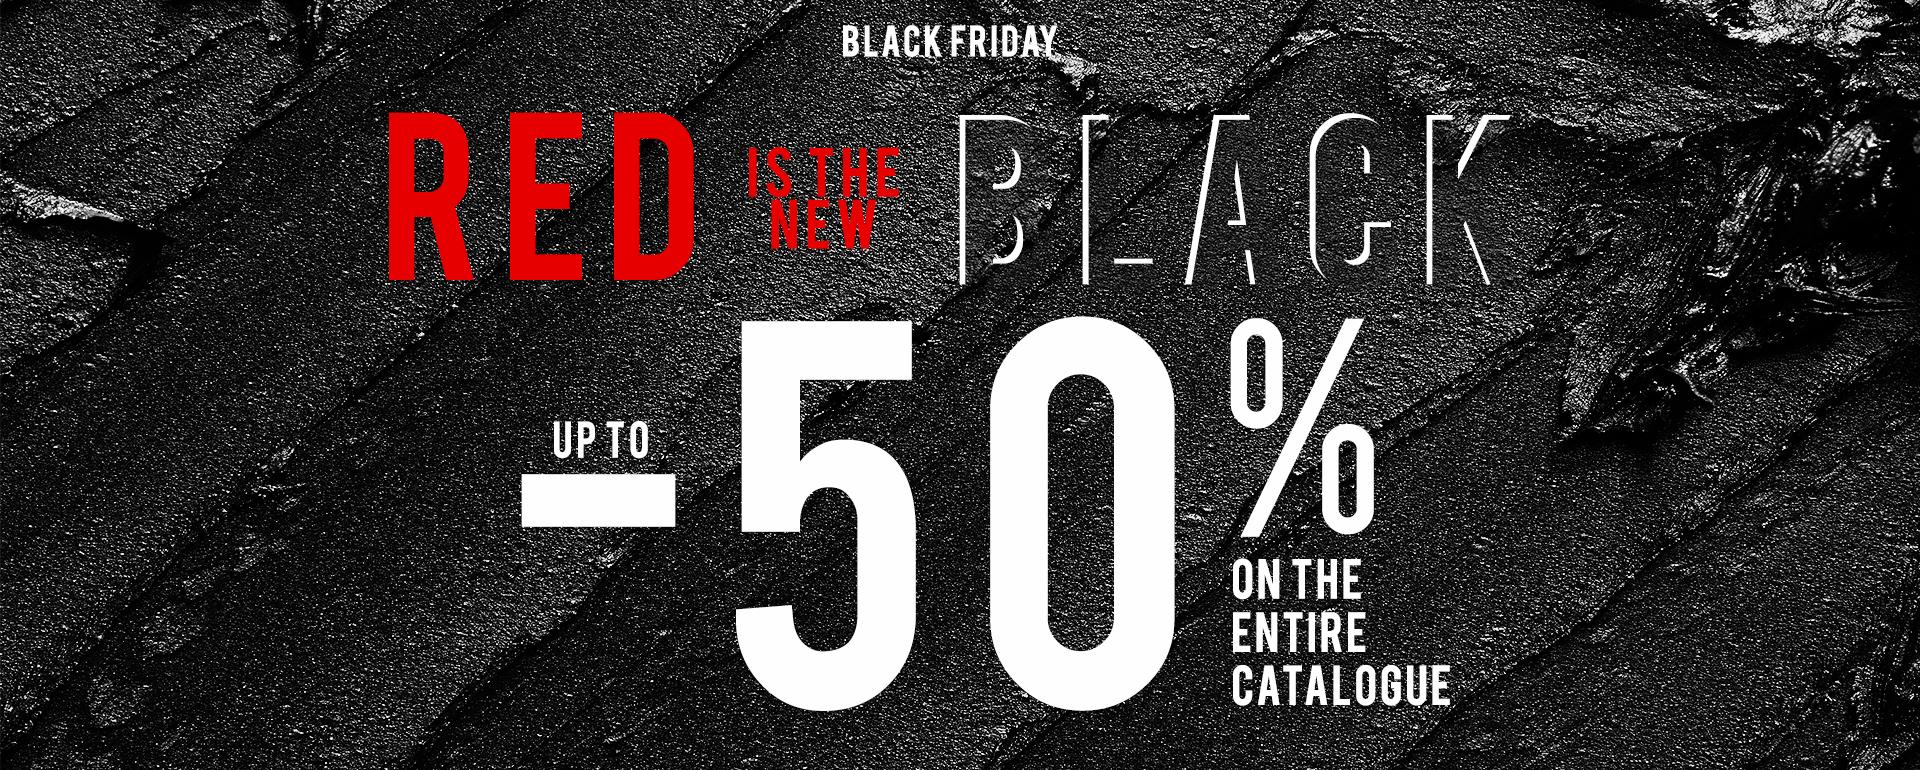 Black Friday - PUPA Milano